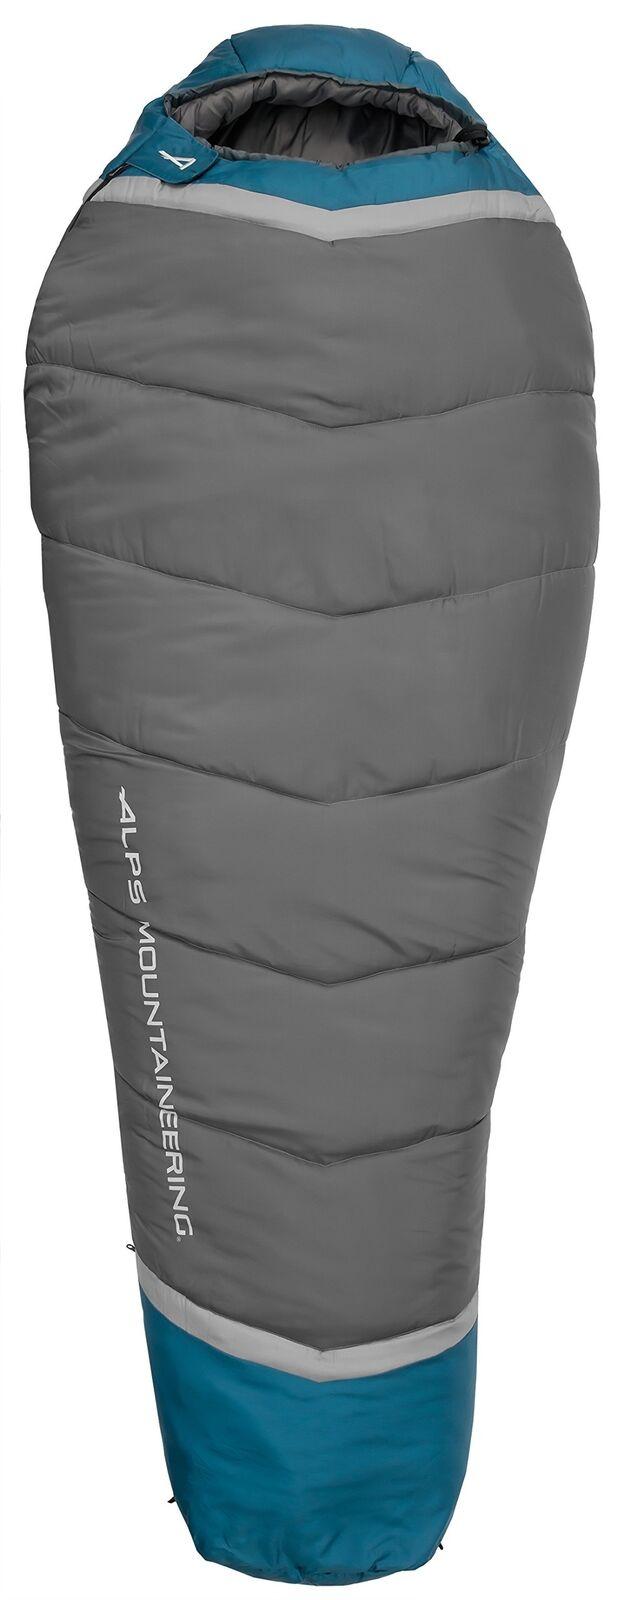 ALPS Mountaineering Blaze 0 Degree Mummy Sleeping Bag Regular